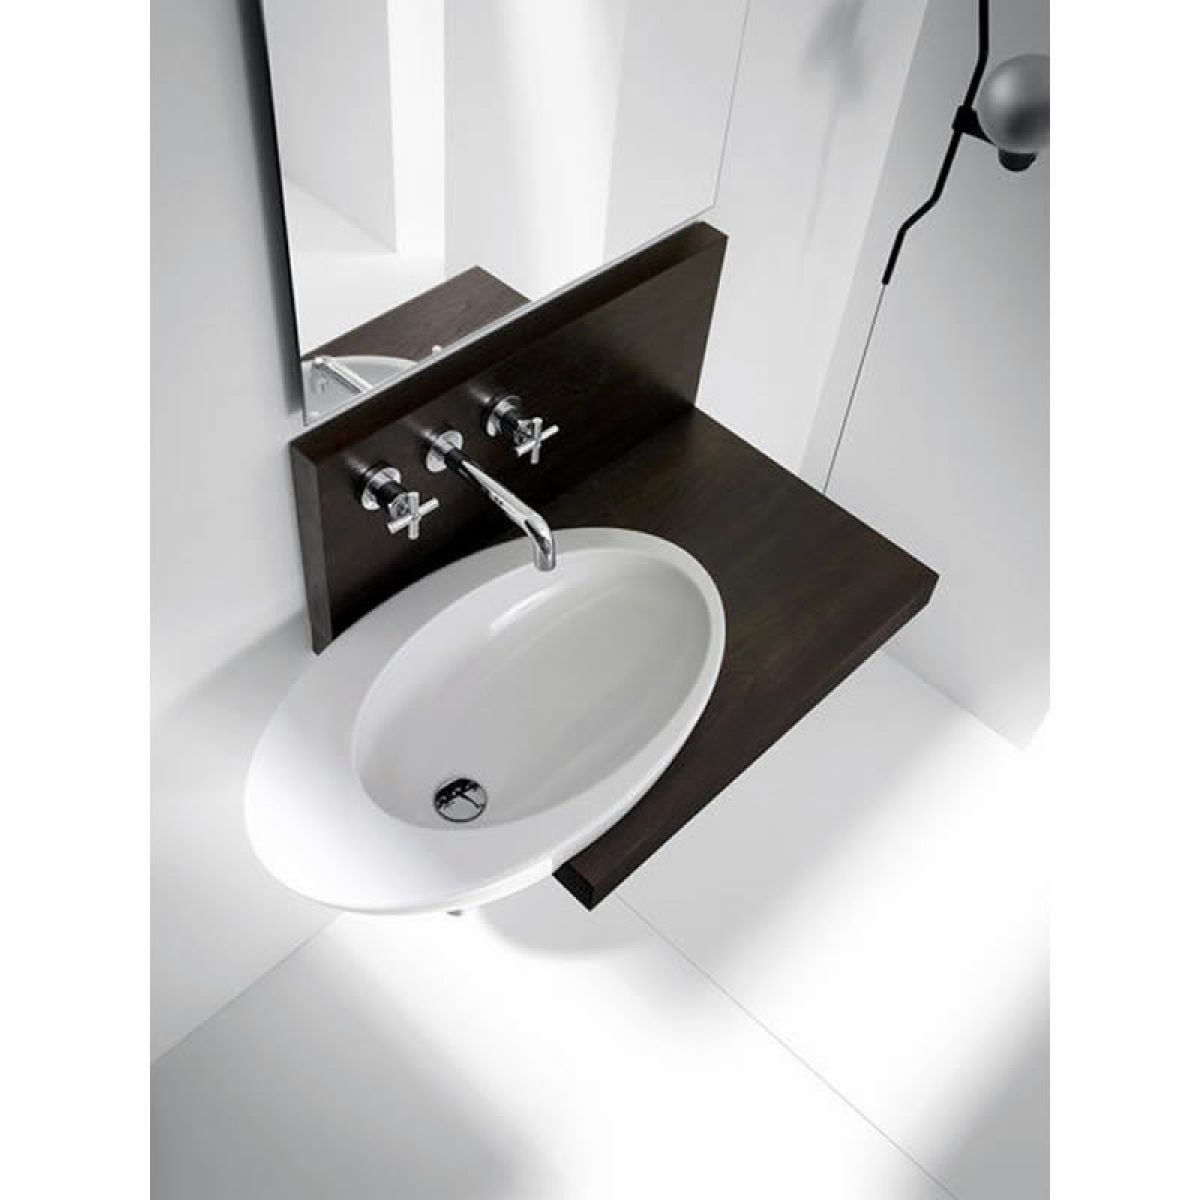 Cibo uber 1200 wall hung vanity from reece - Roca Eliptic Wall Hung Basin A327426000 Uk Bathrooms